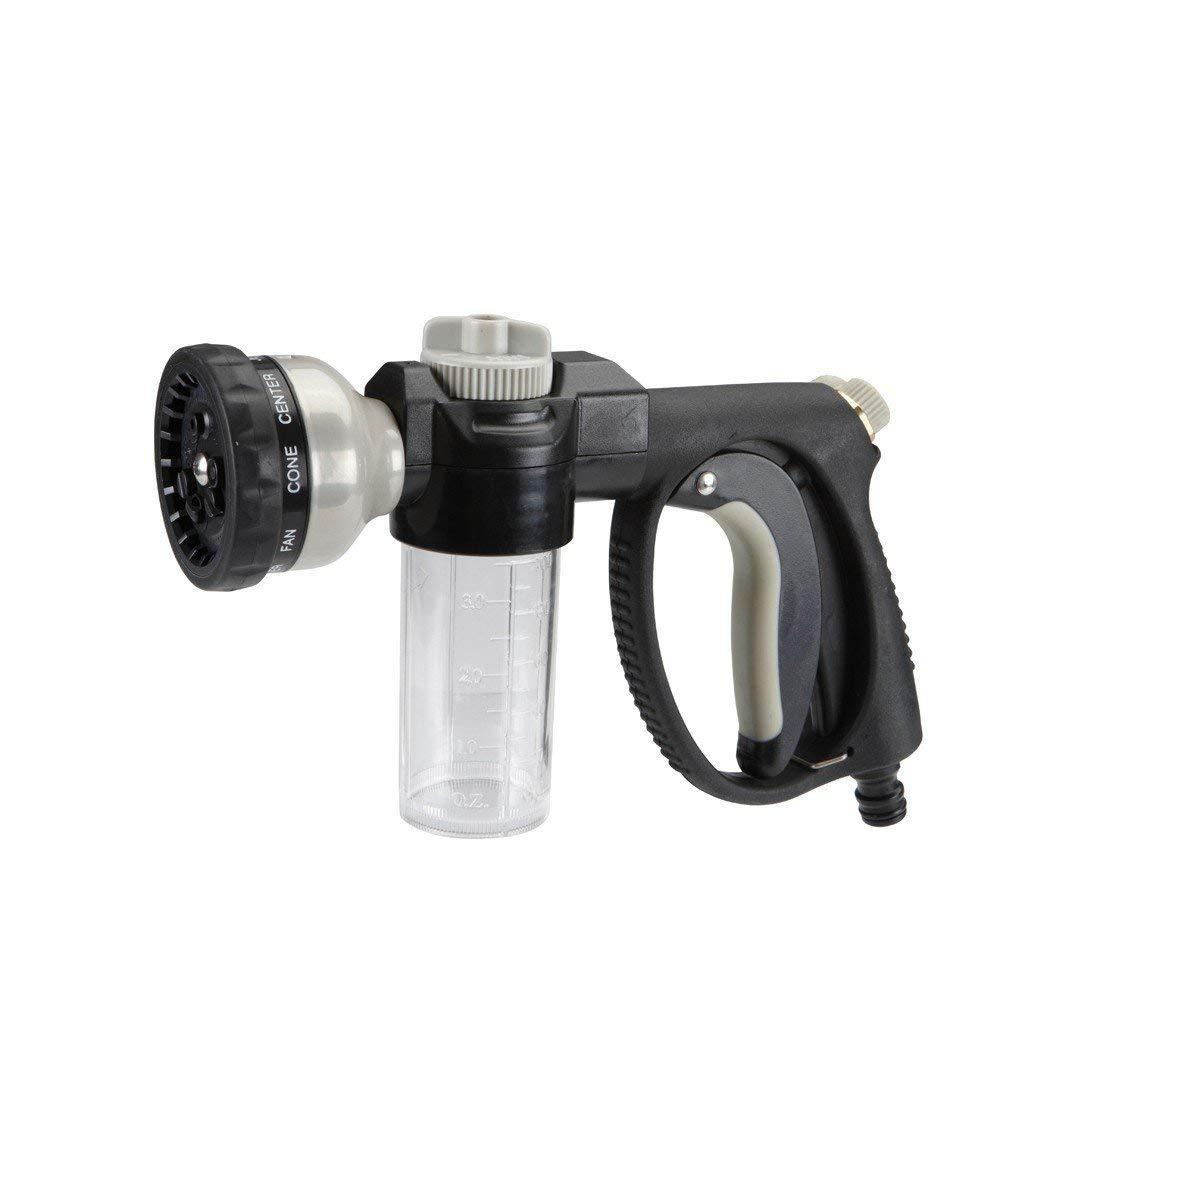 Amazon Com Car Wash Nozzle With Soap Dispenser And Nine Spray